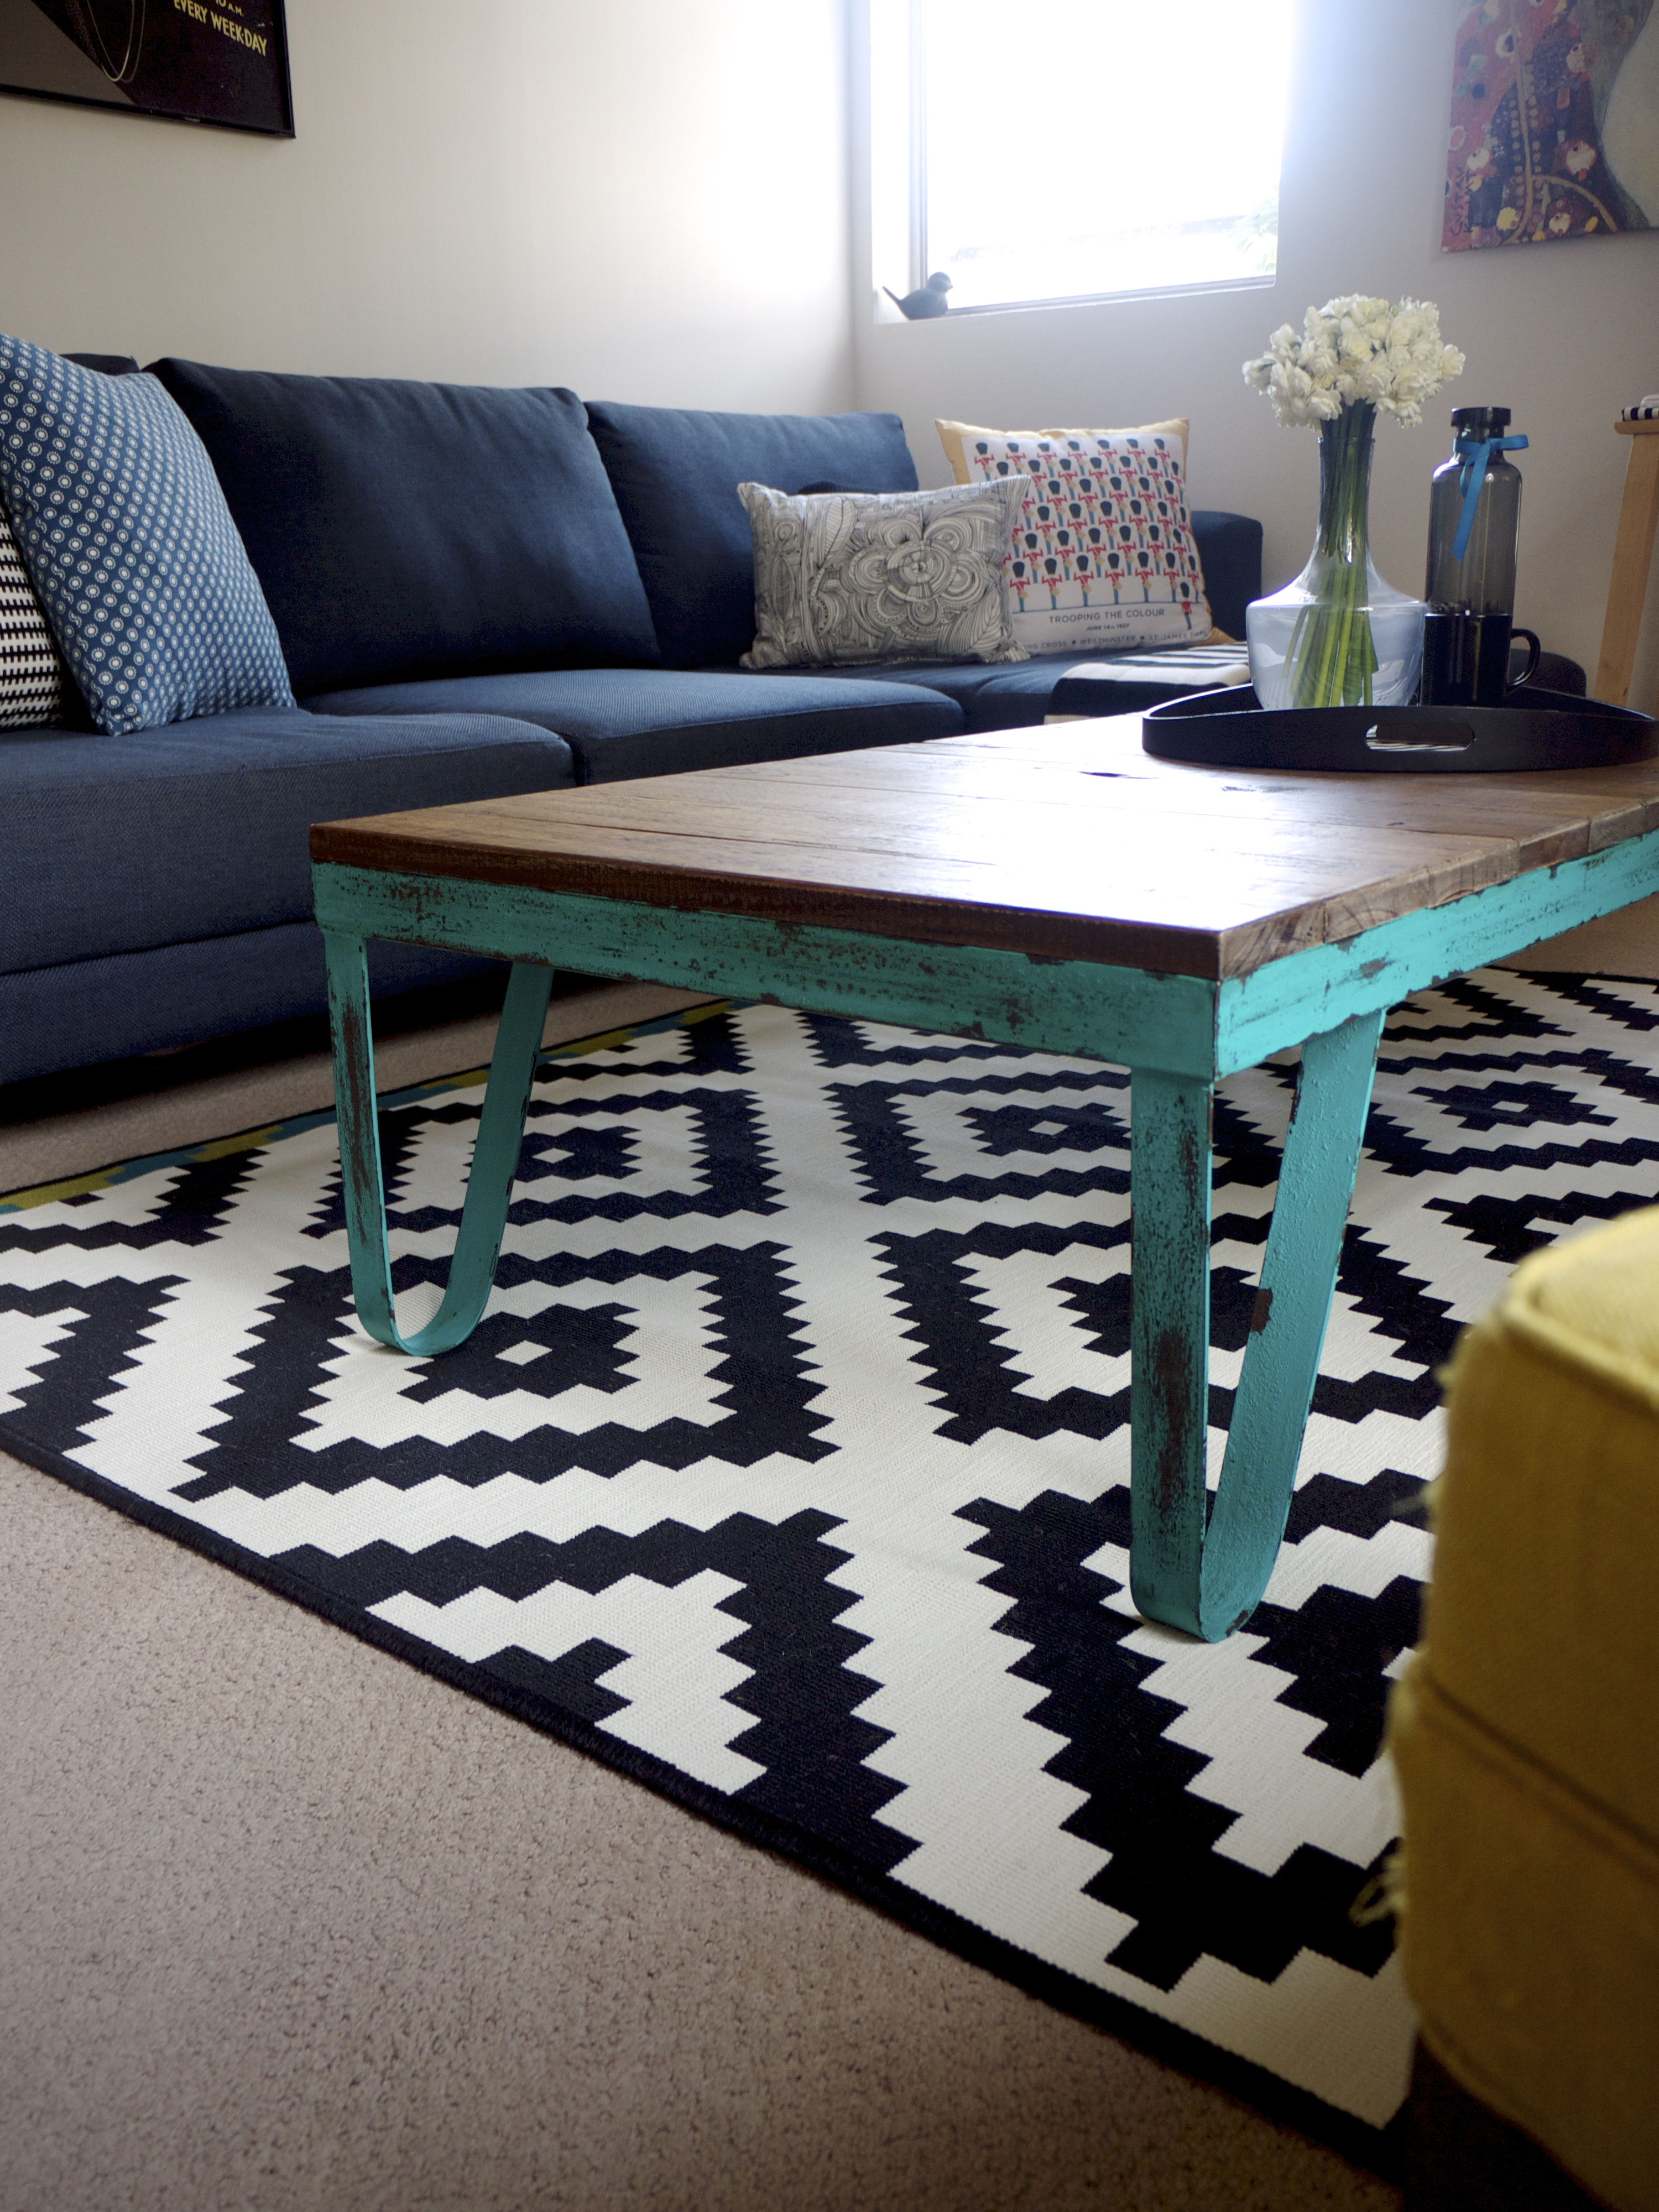 Living Room Design Ikea: My IKEA Winter Living Room Makeover